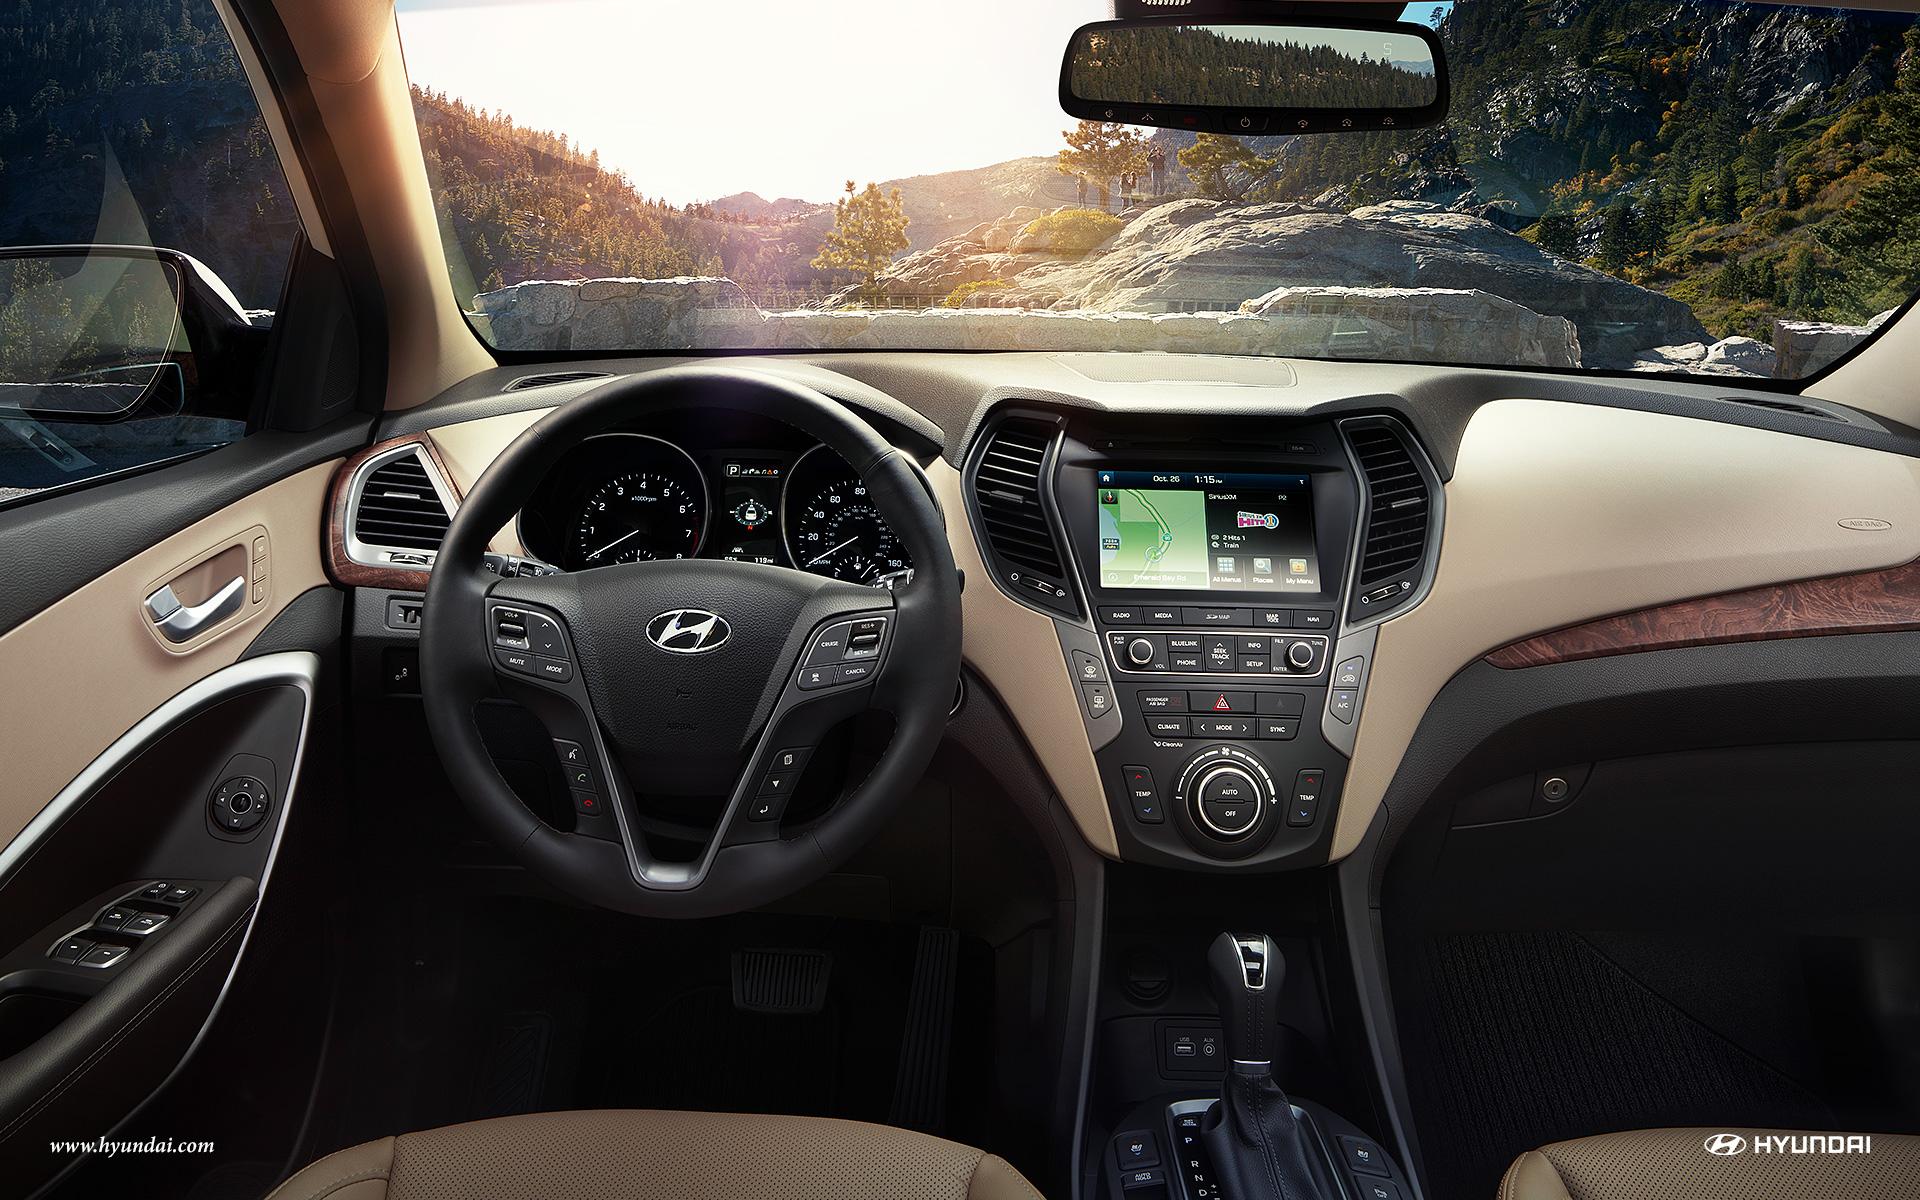 2018 Hyundai Santa Fe Sport Leasing near College Park MD Pohanka